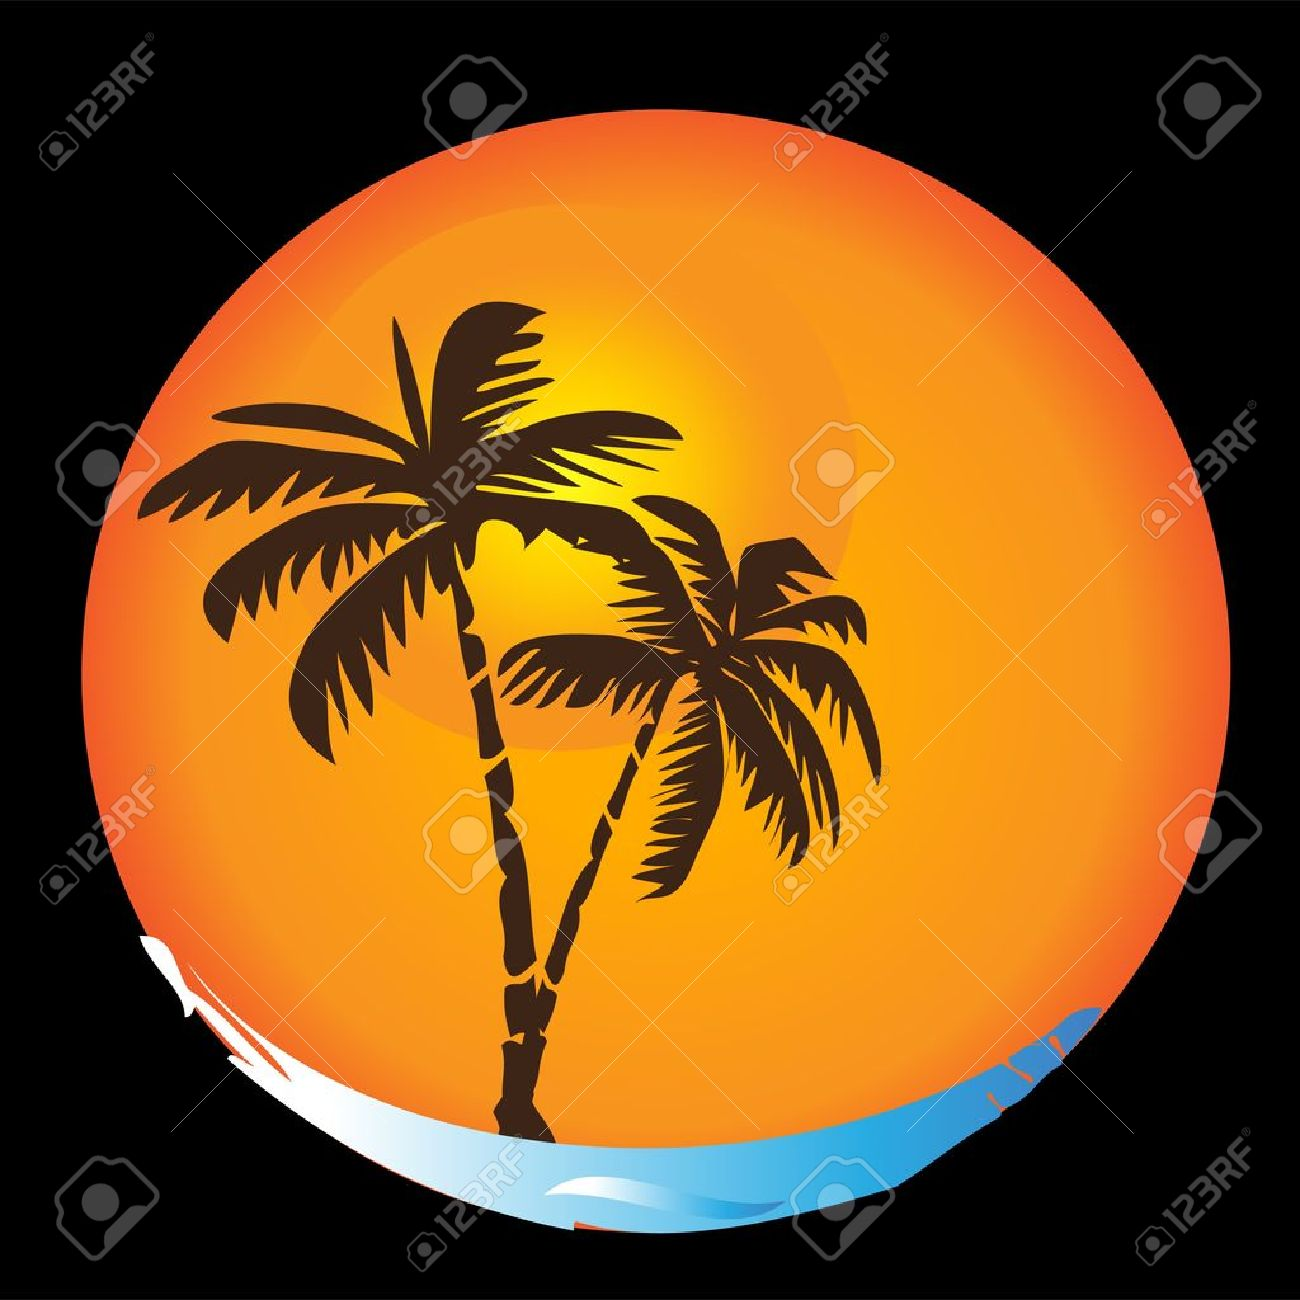 Tropical sun beaches palms apt logo Stock Vector - 10893597